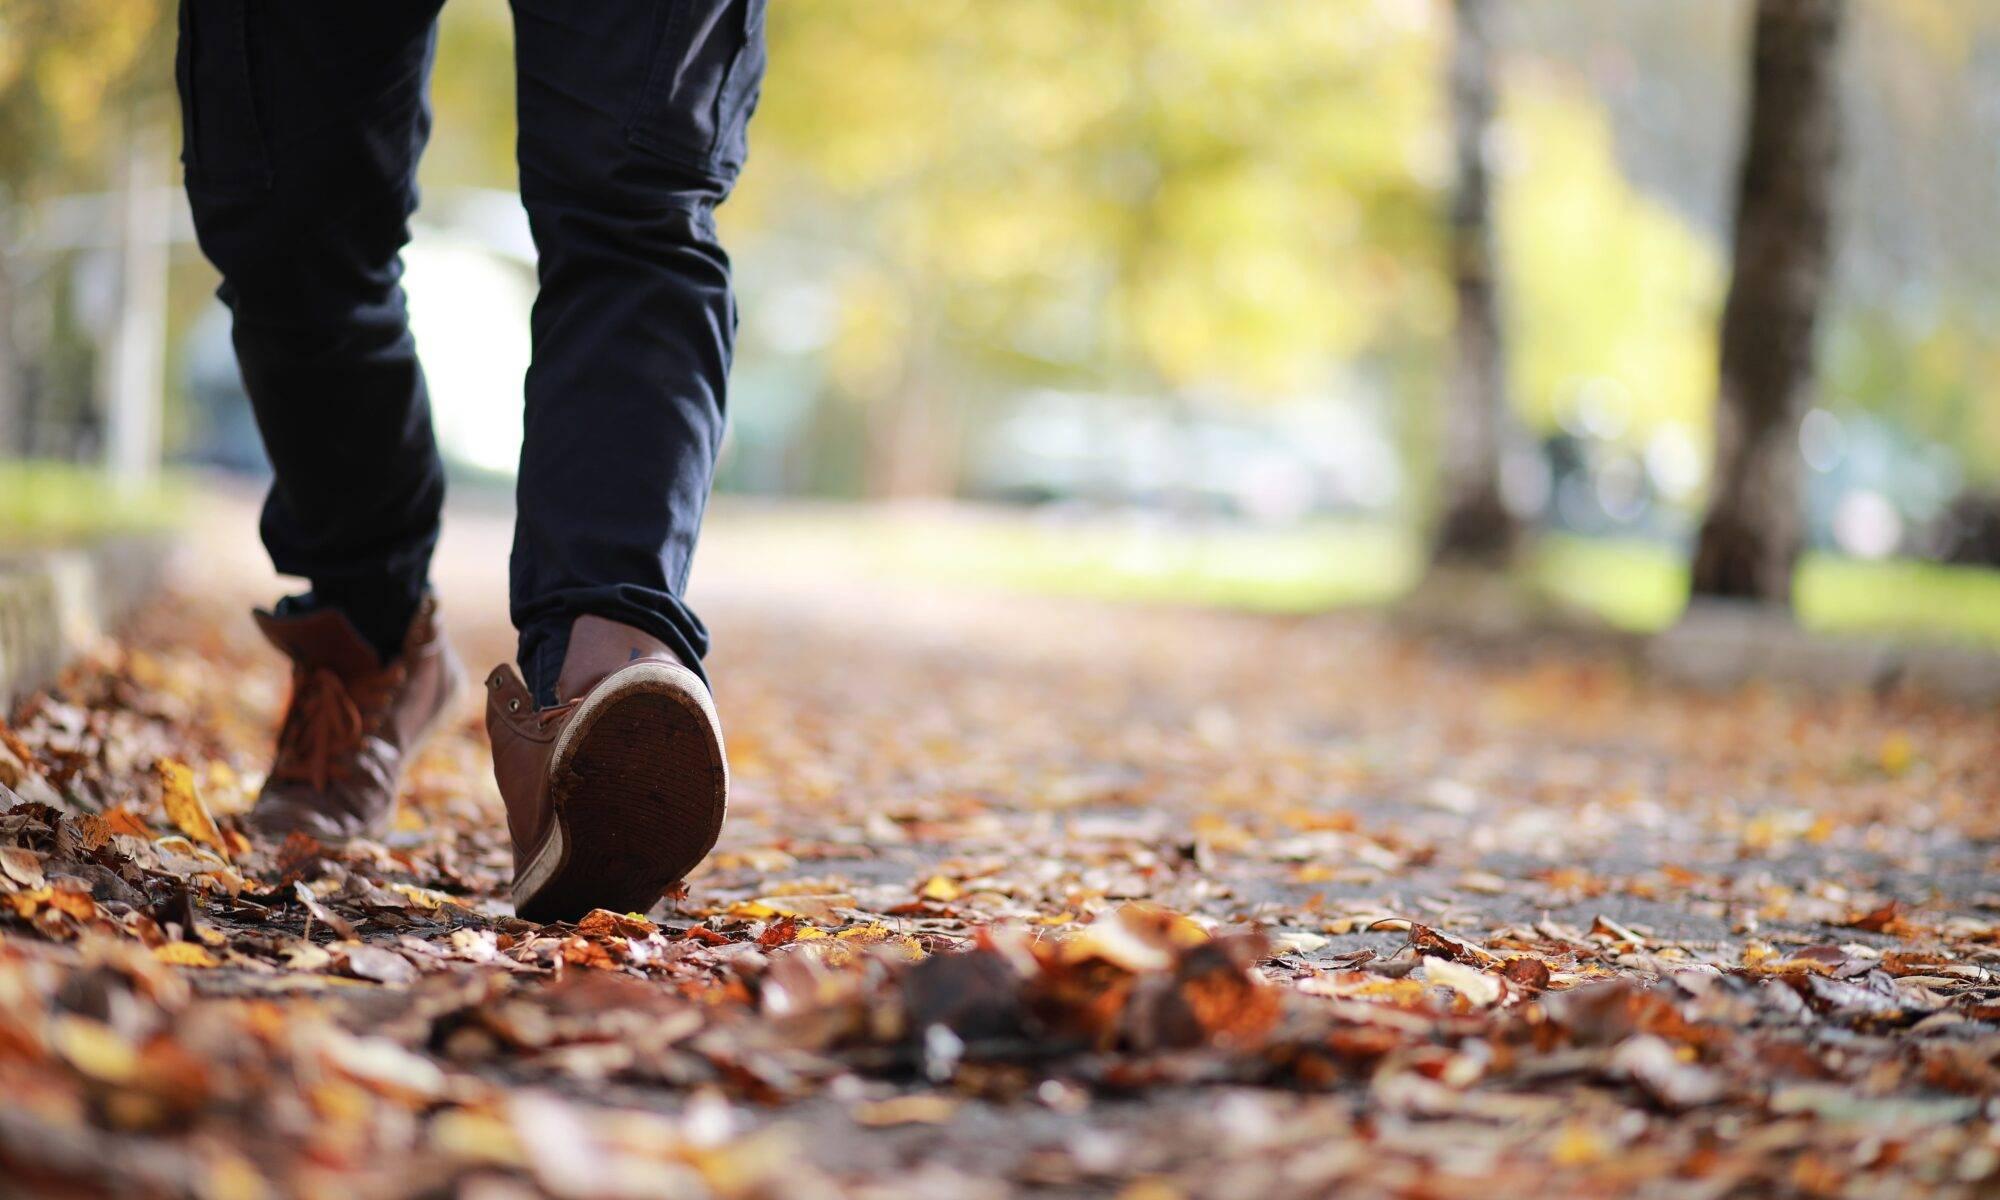 Walking through the autumn leaves